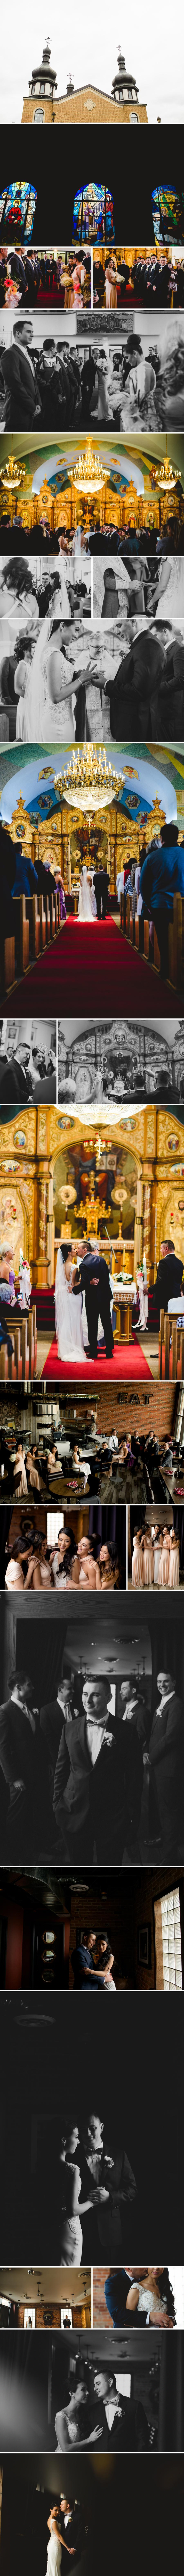 bbcollective_yeg_blog_2017_vivianandstefan_wedding_photographycomp002.jpg